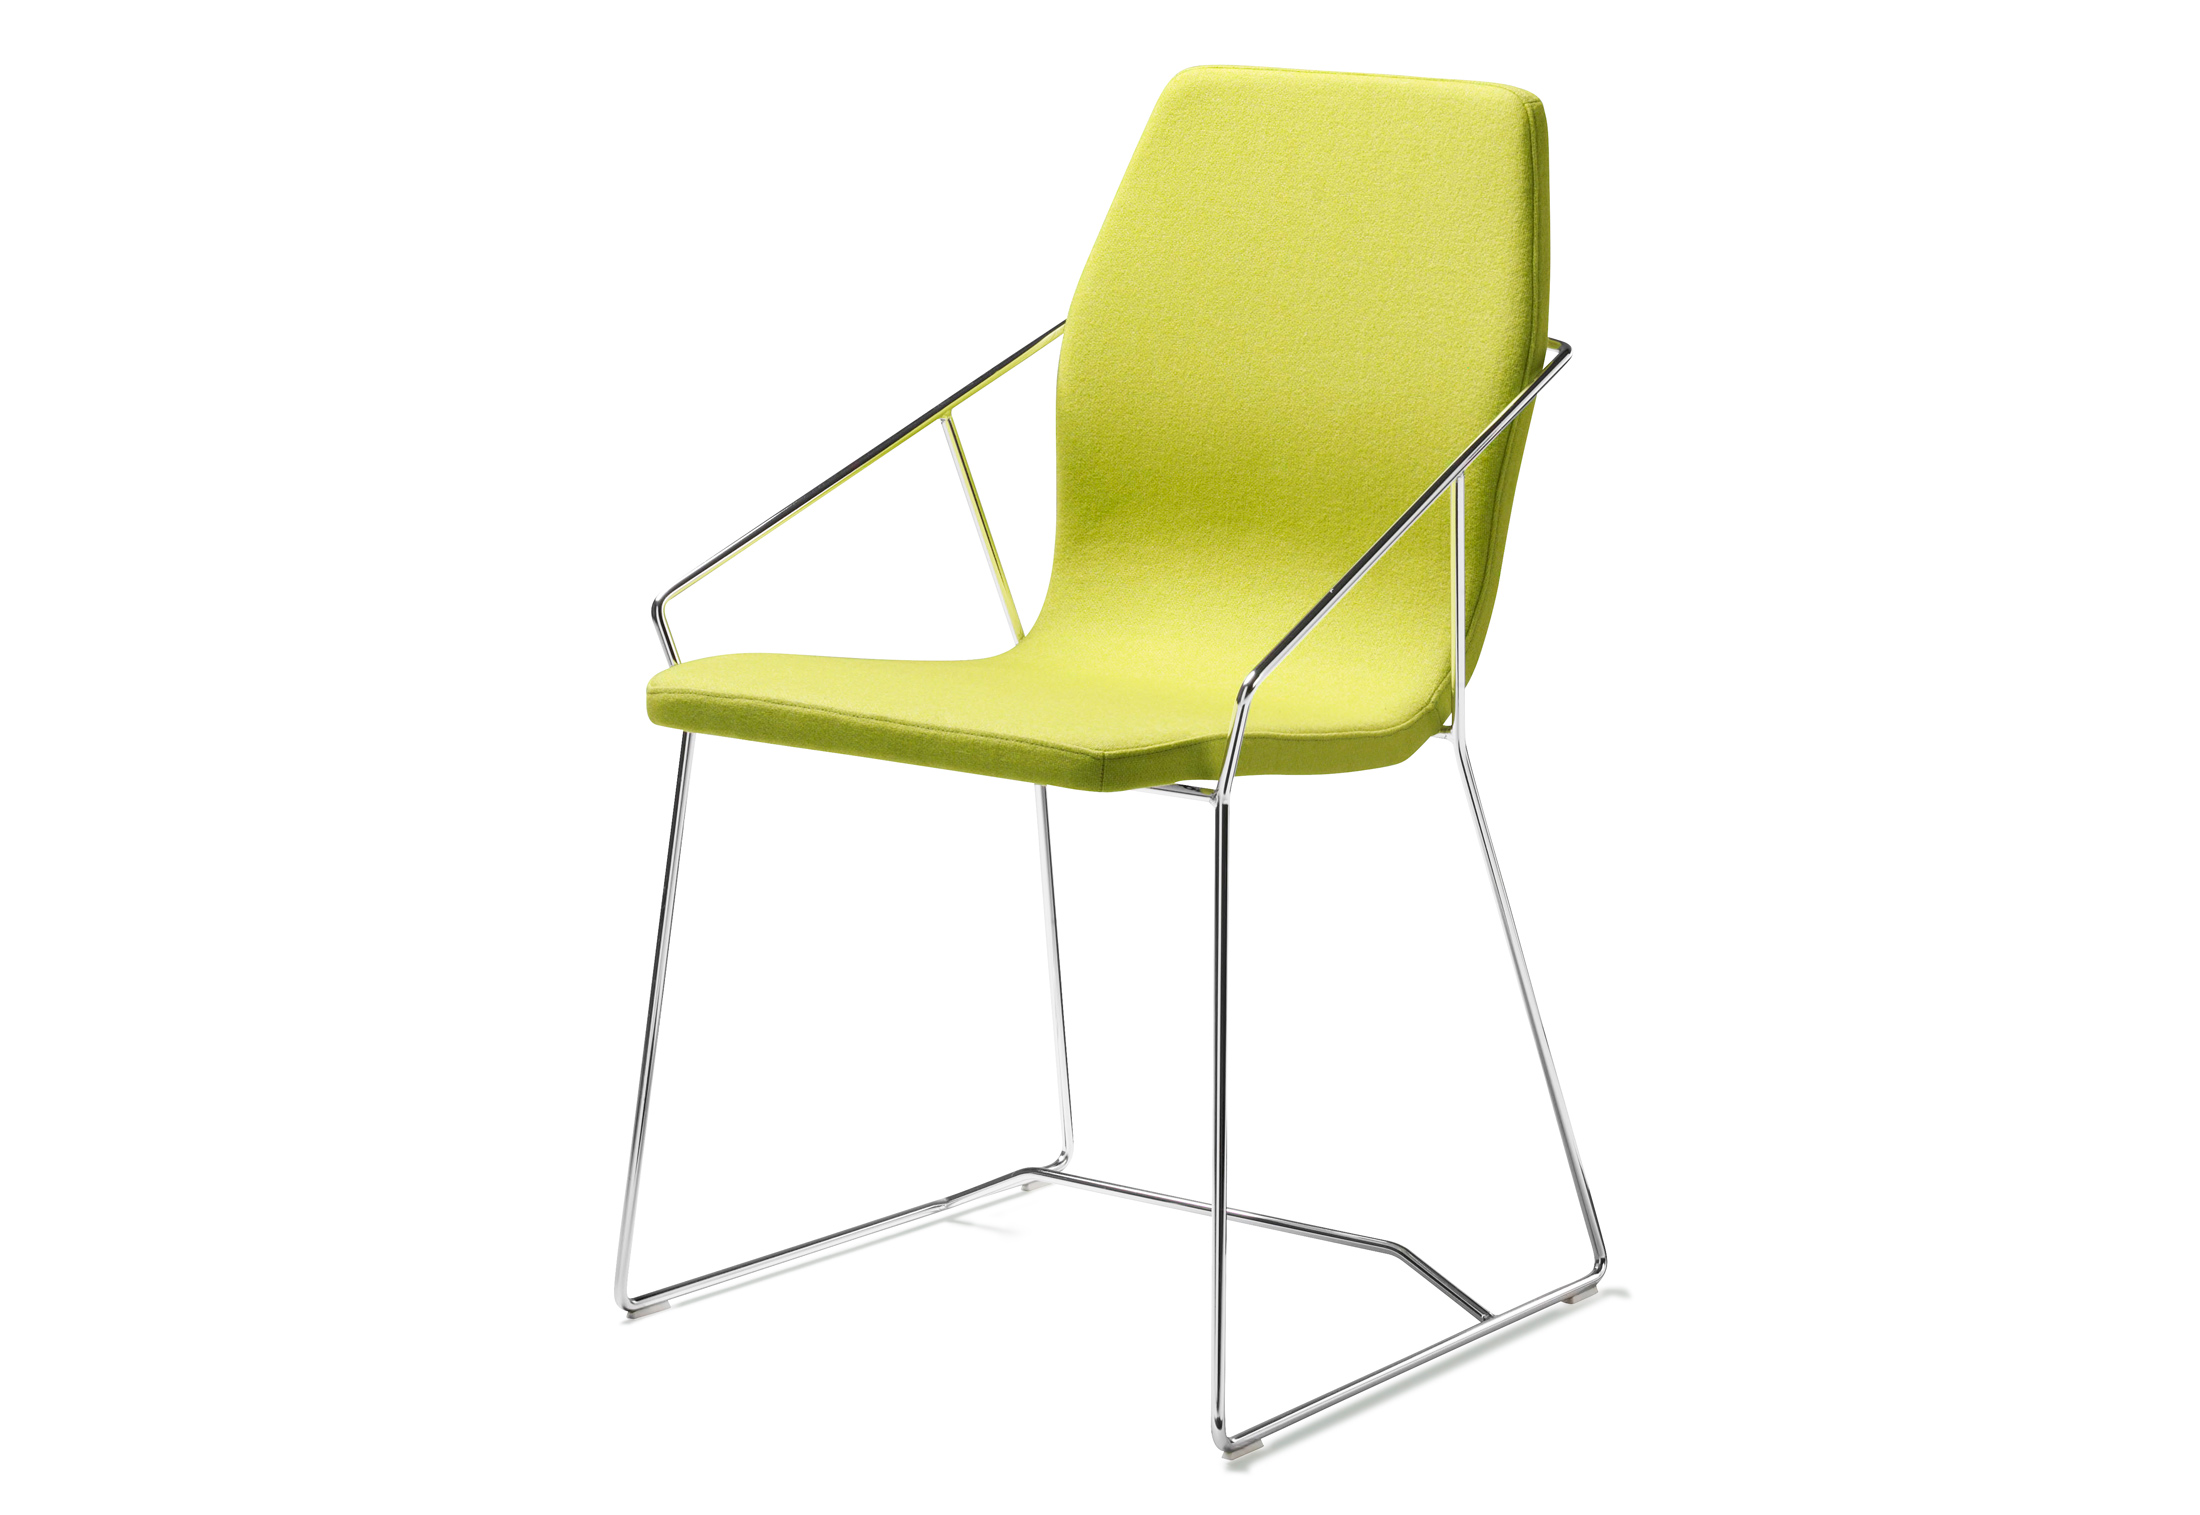 Aeon chair  Aeon chair  Aeon chair ...